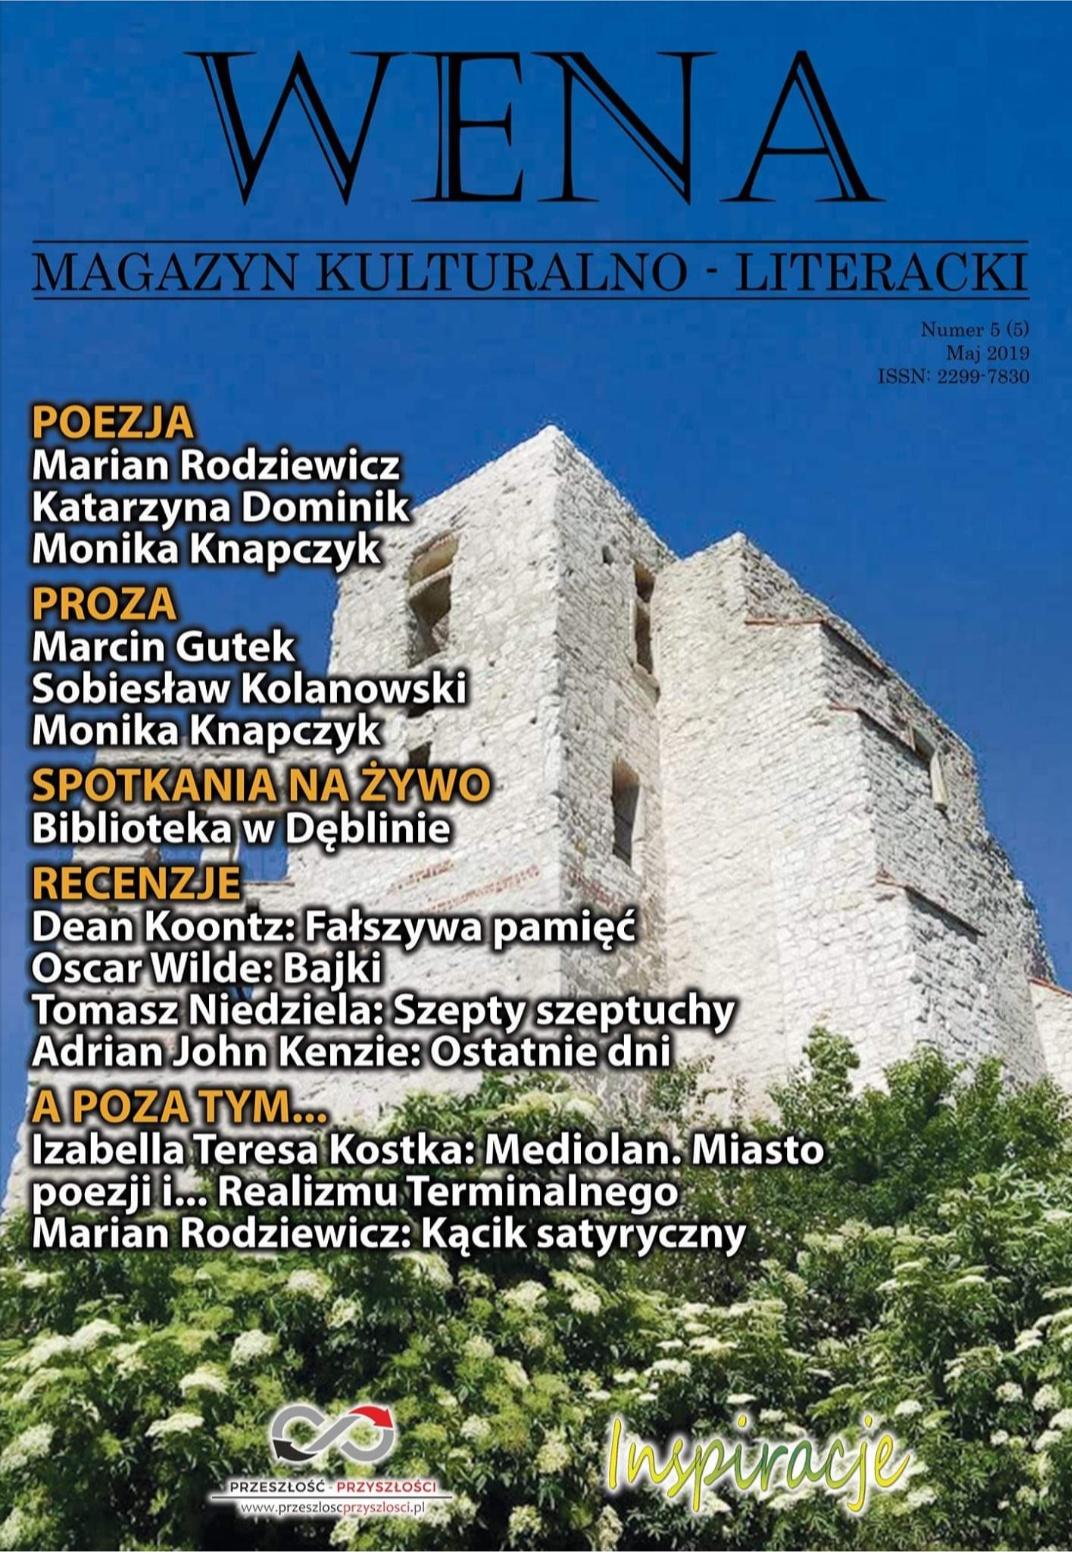 "SEZIONE BILINGUE: Rivista polacca ""Wena"" e il Realismo Terminale / Magazyn literacki ""Wena"" i RealizmTerminalny"